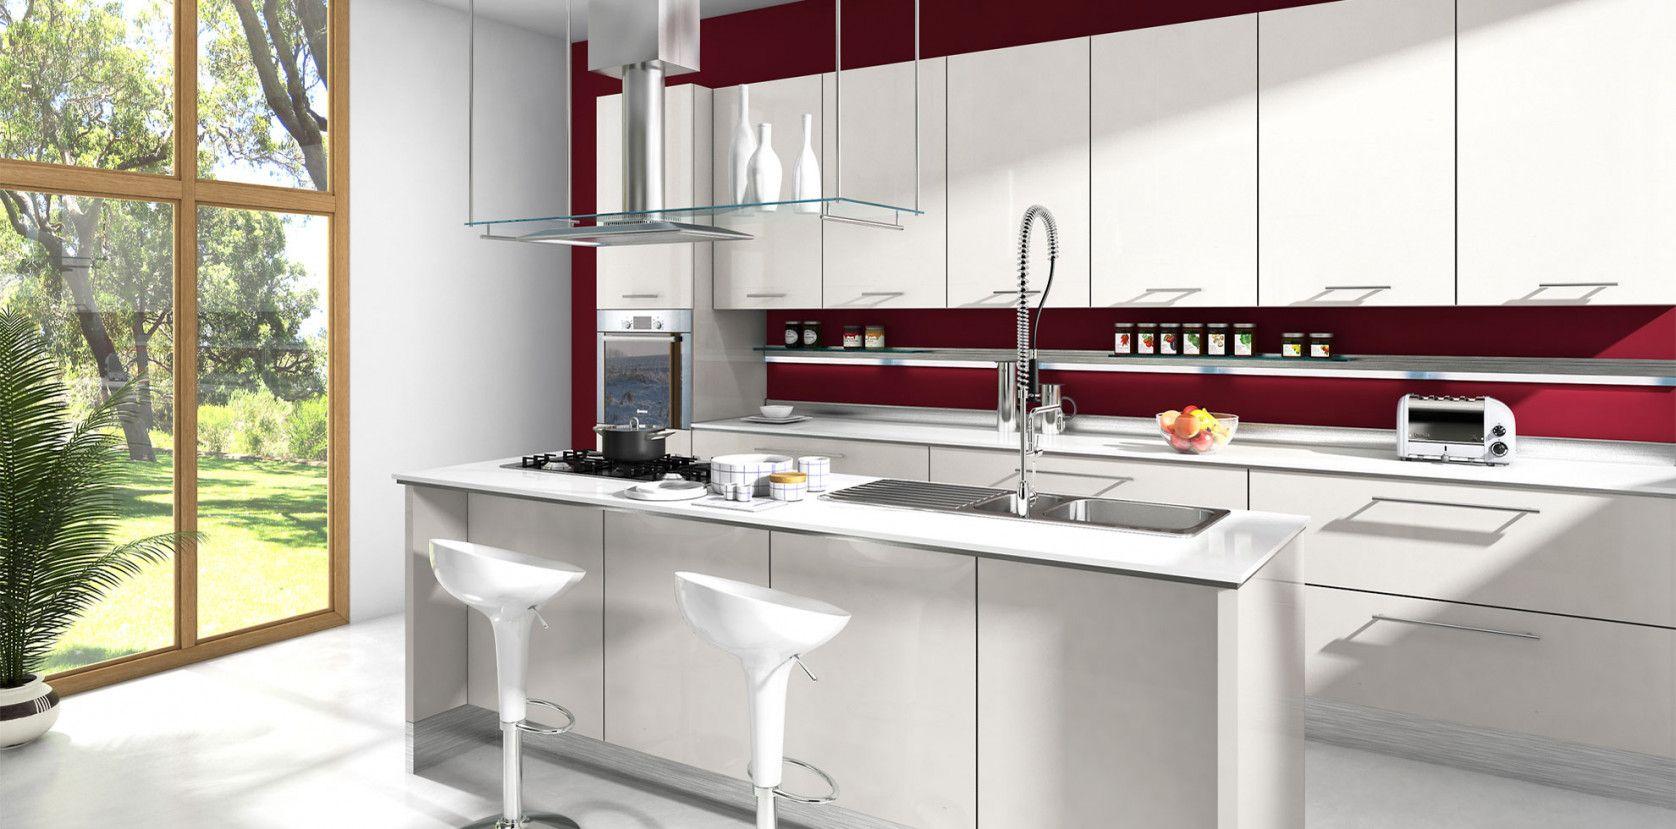 77 Modern Kitchen Cabinets Miami Corner Kitchen Cupboard Ideas Check More At Http Www Planet Kitchen Cabinet Styles Modern Kitchen Modern Kitchen Cabinets